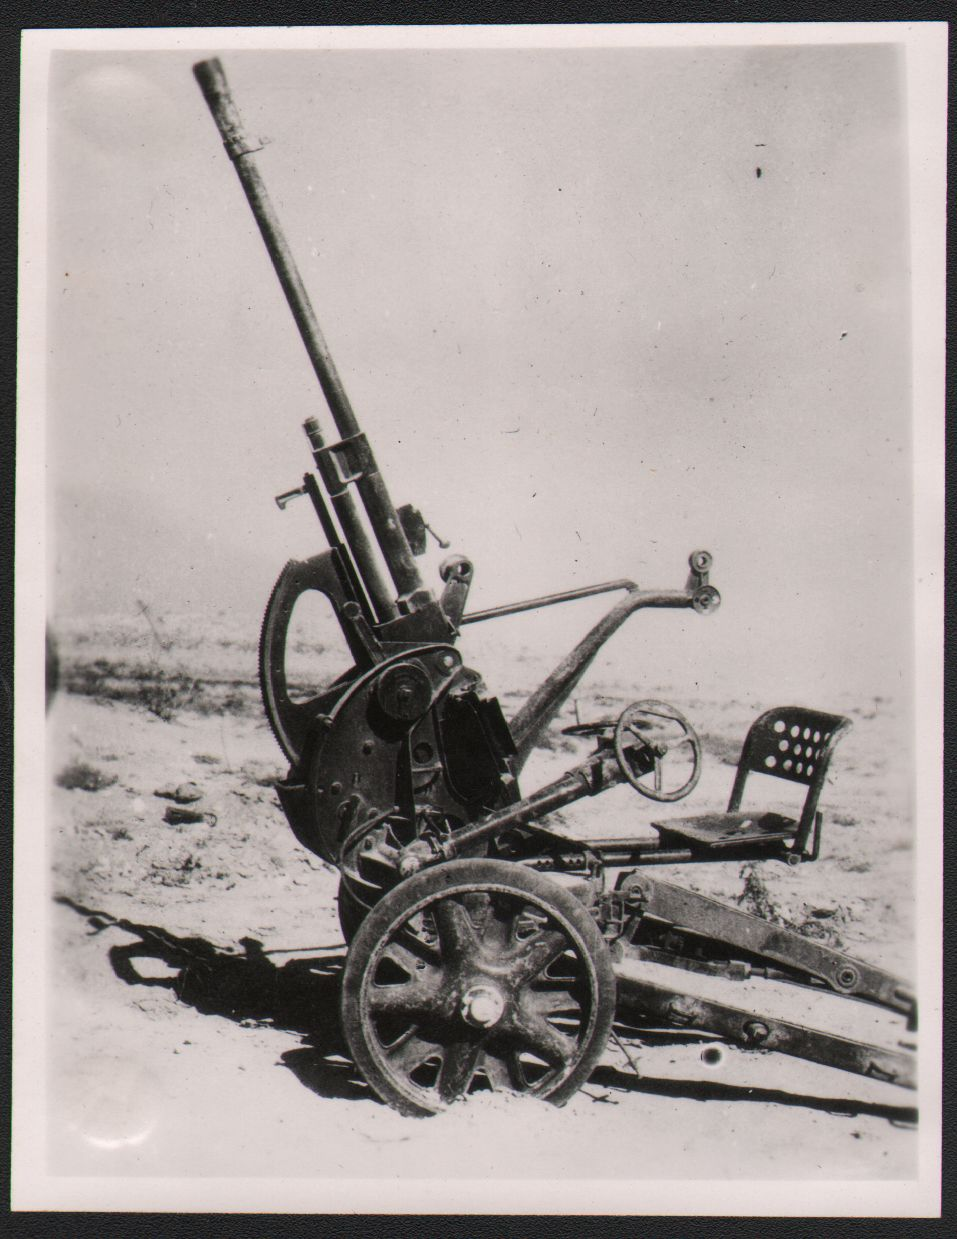 World War 2, Western Desert Campaign, Egypt, Big Gun, War Machine